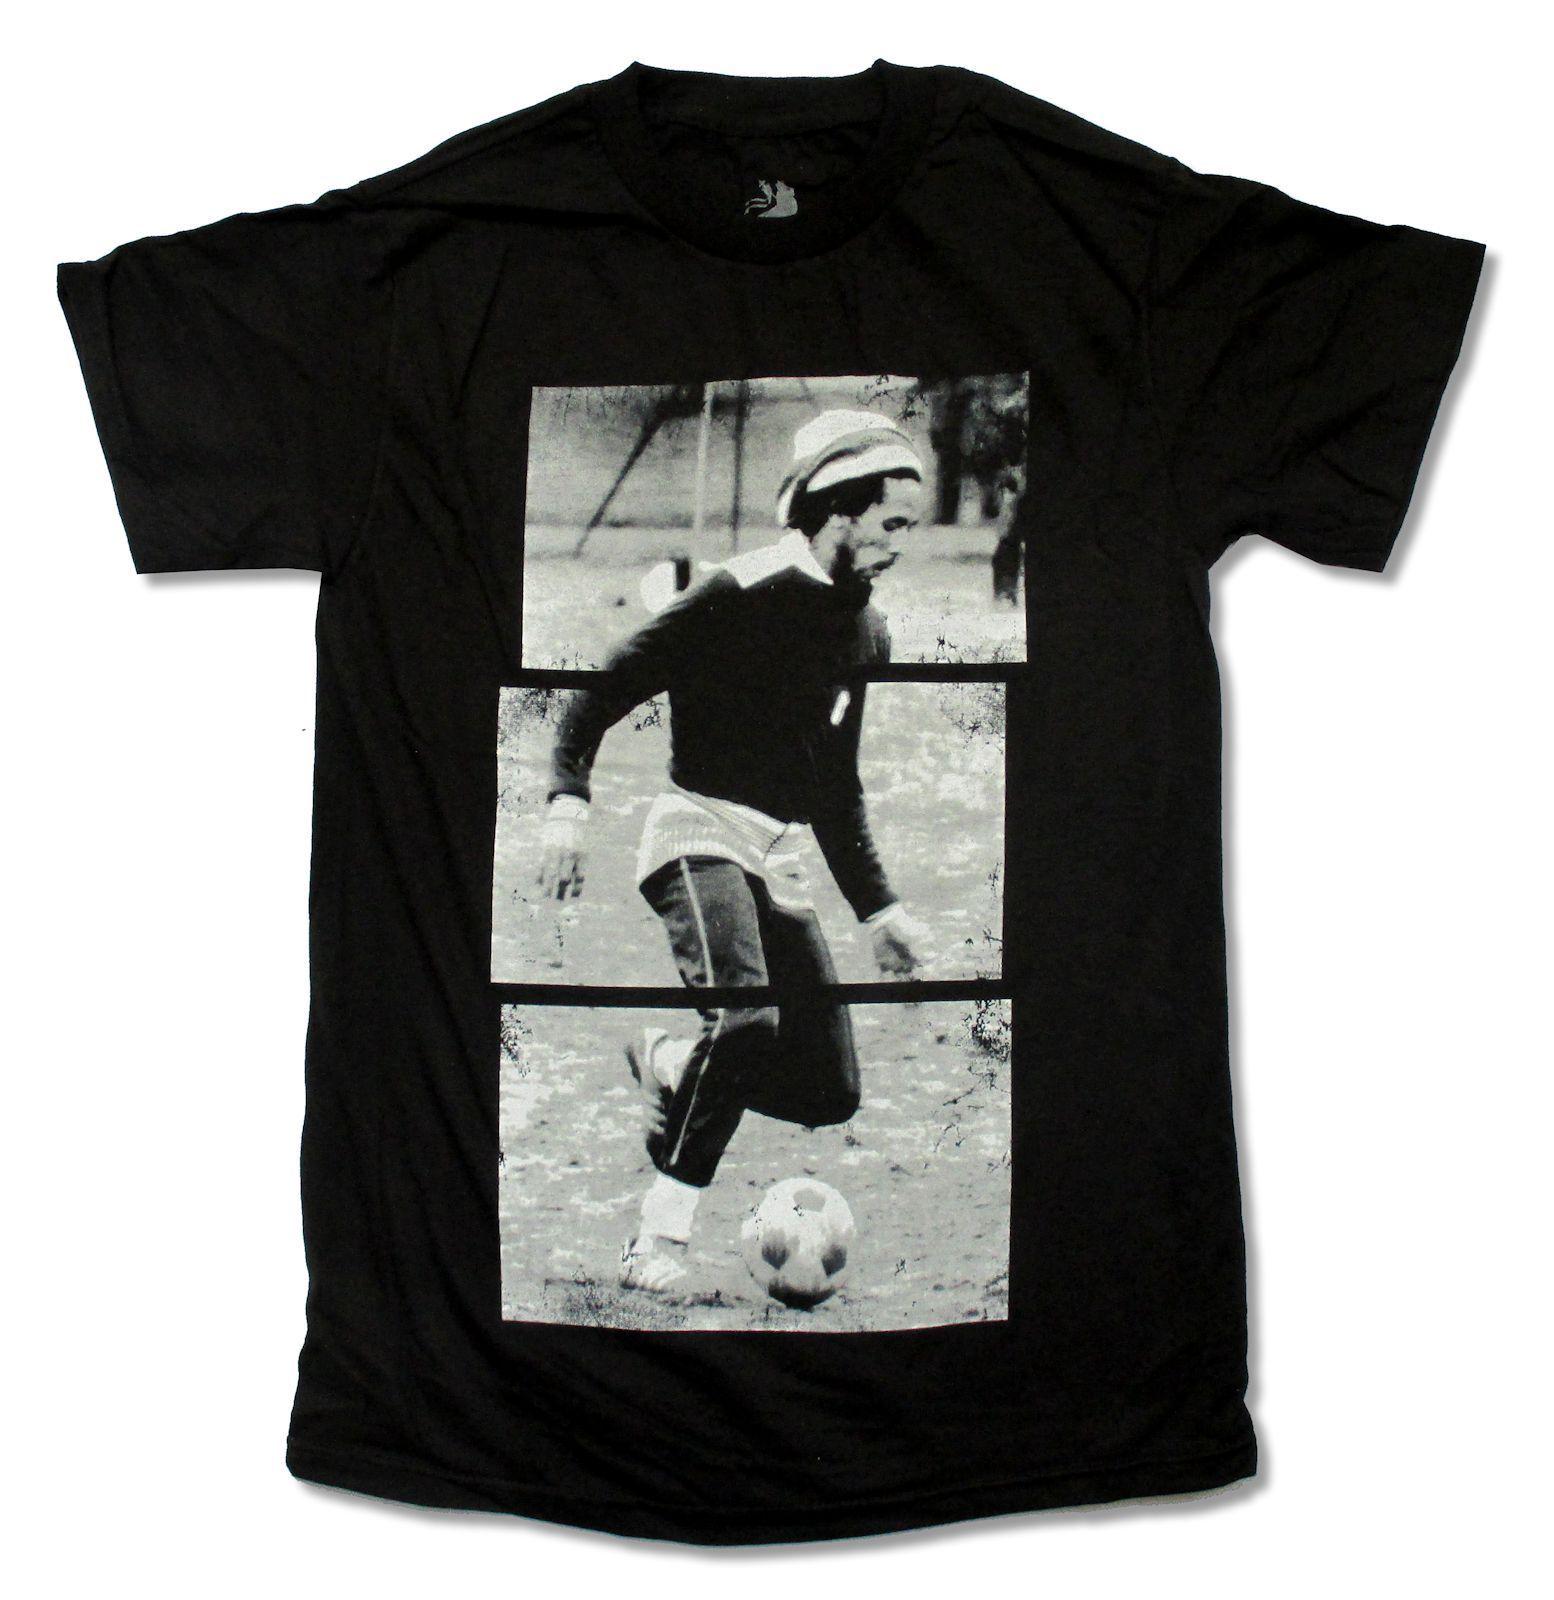 Bob Marley Soccer Stripes Image Black T Shirt Three Little